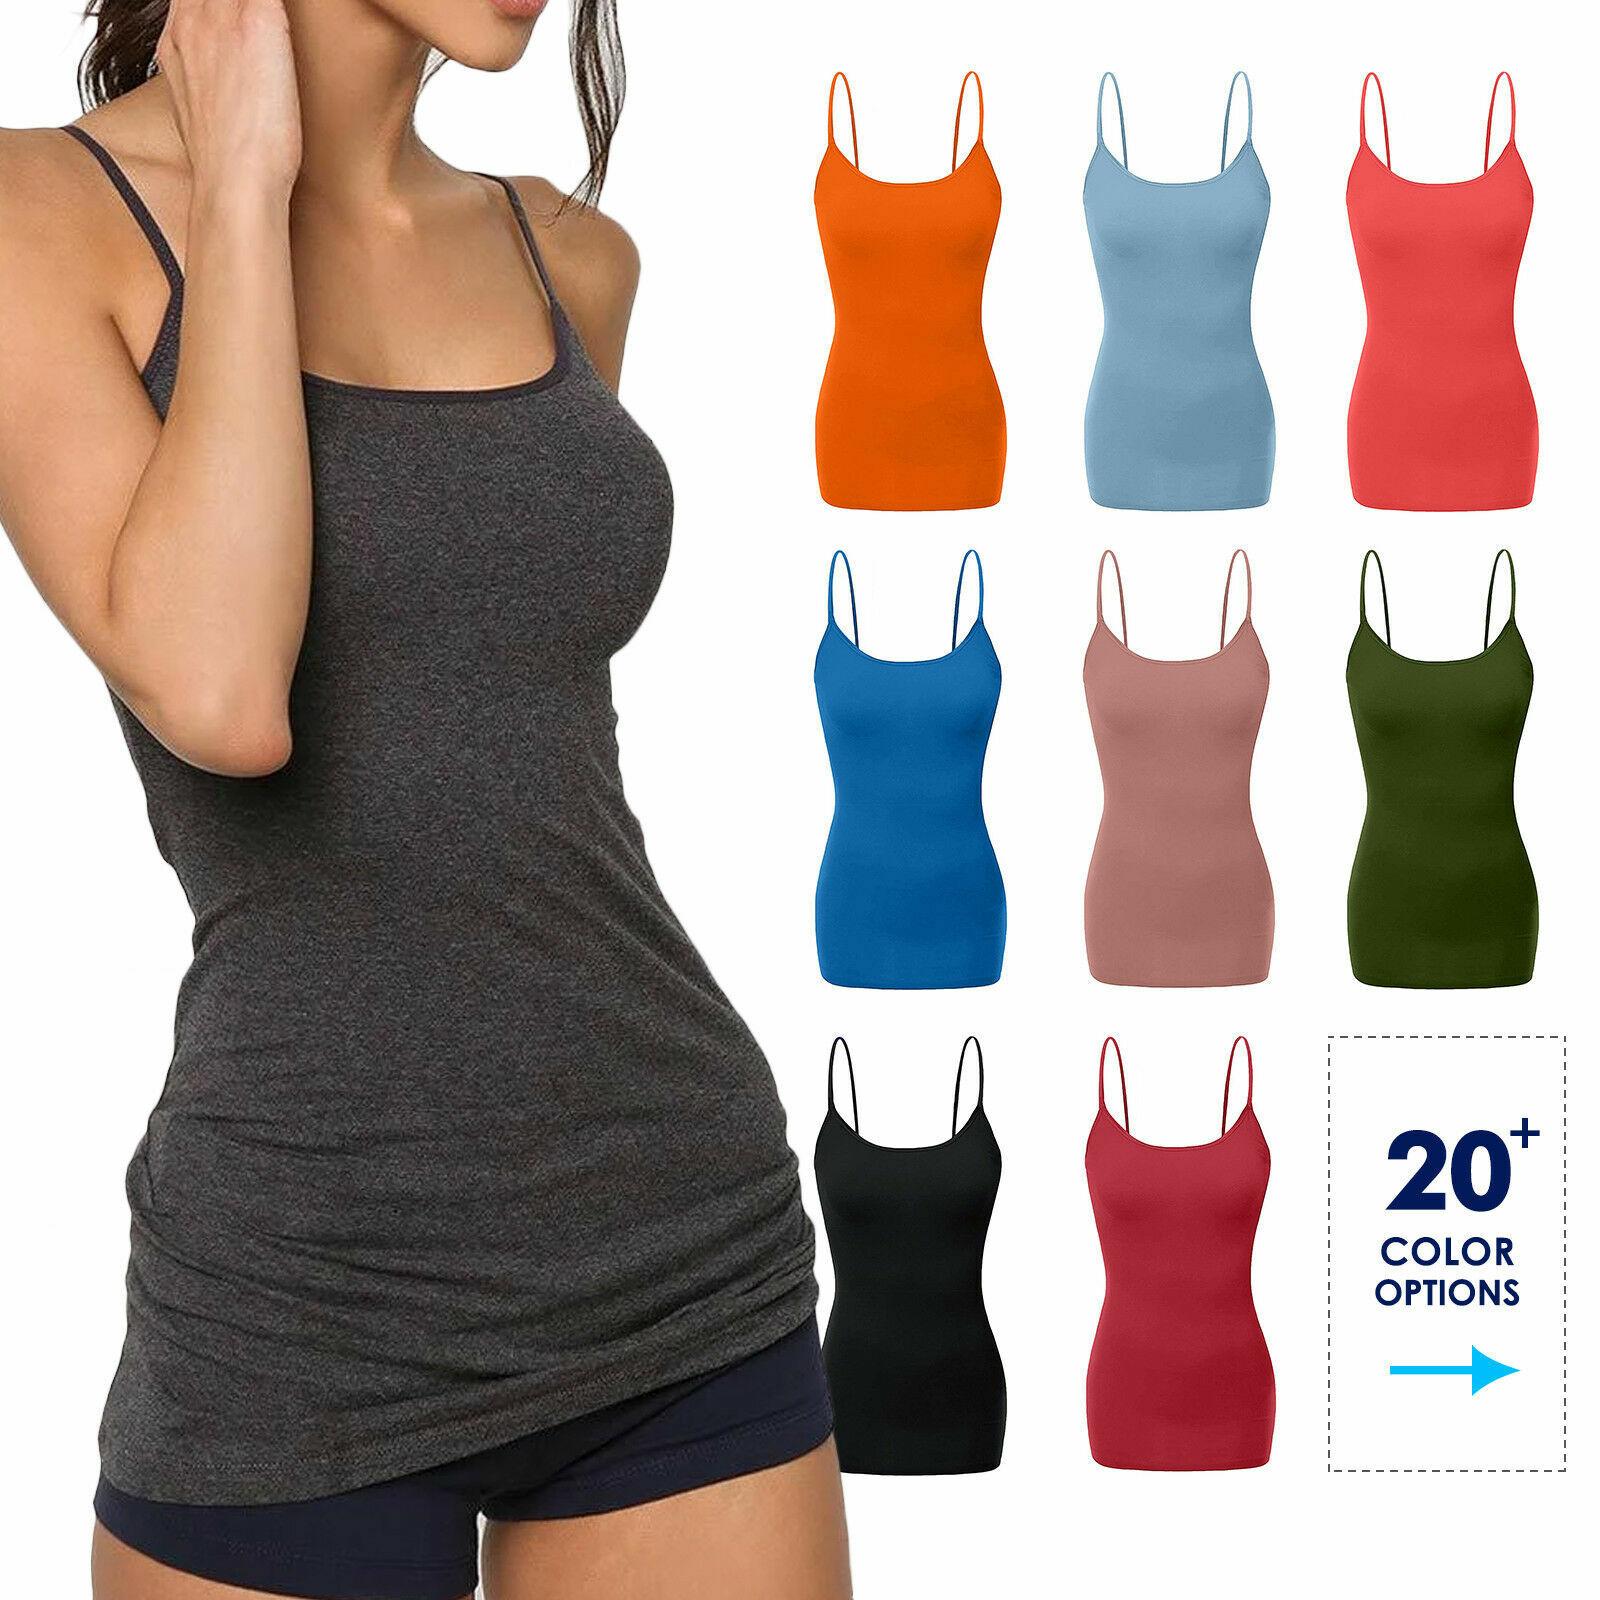 Women/'s Long Tunic Basic Layering Spaghetti Strap Tank Top Cotton Camisole Plain